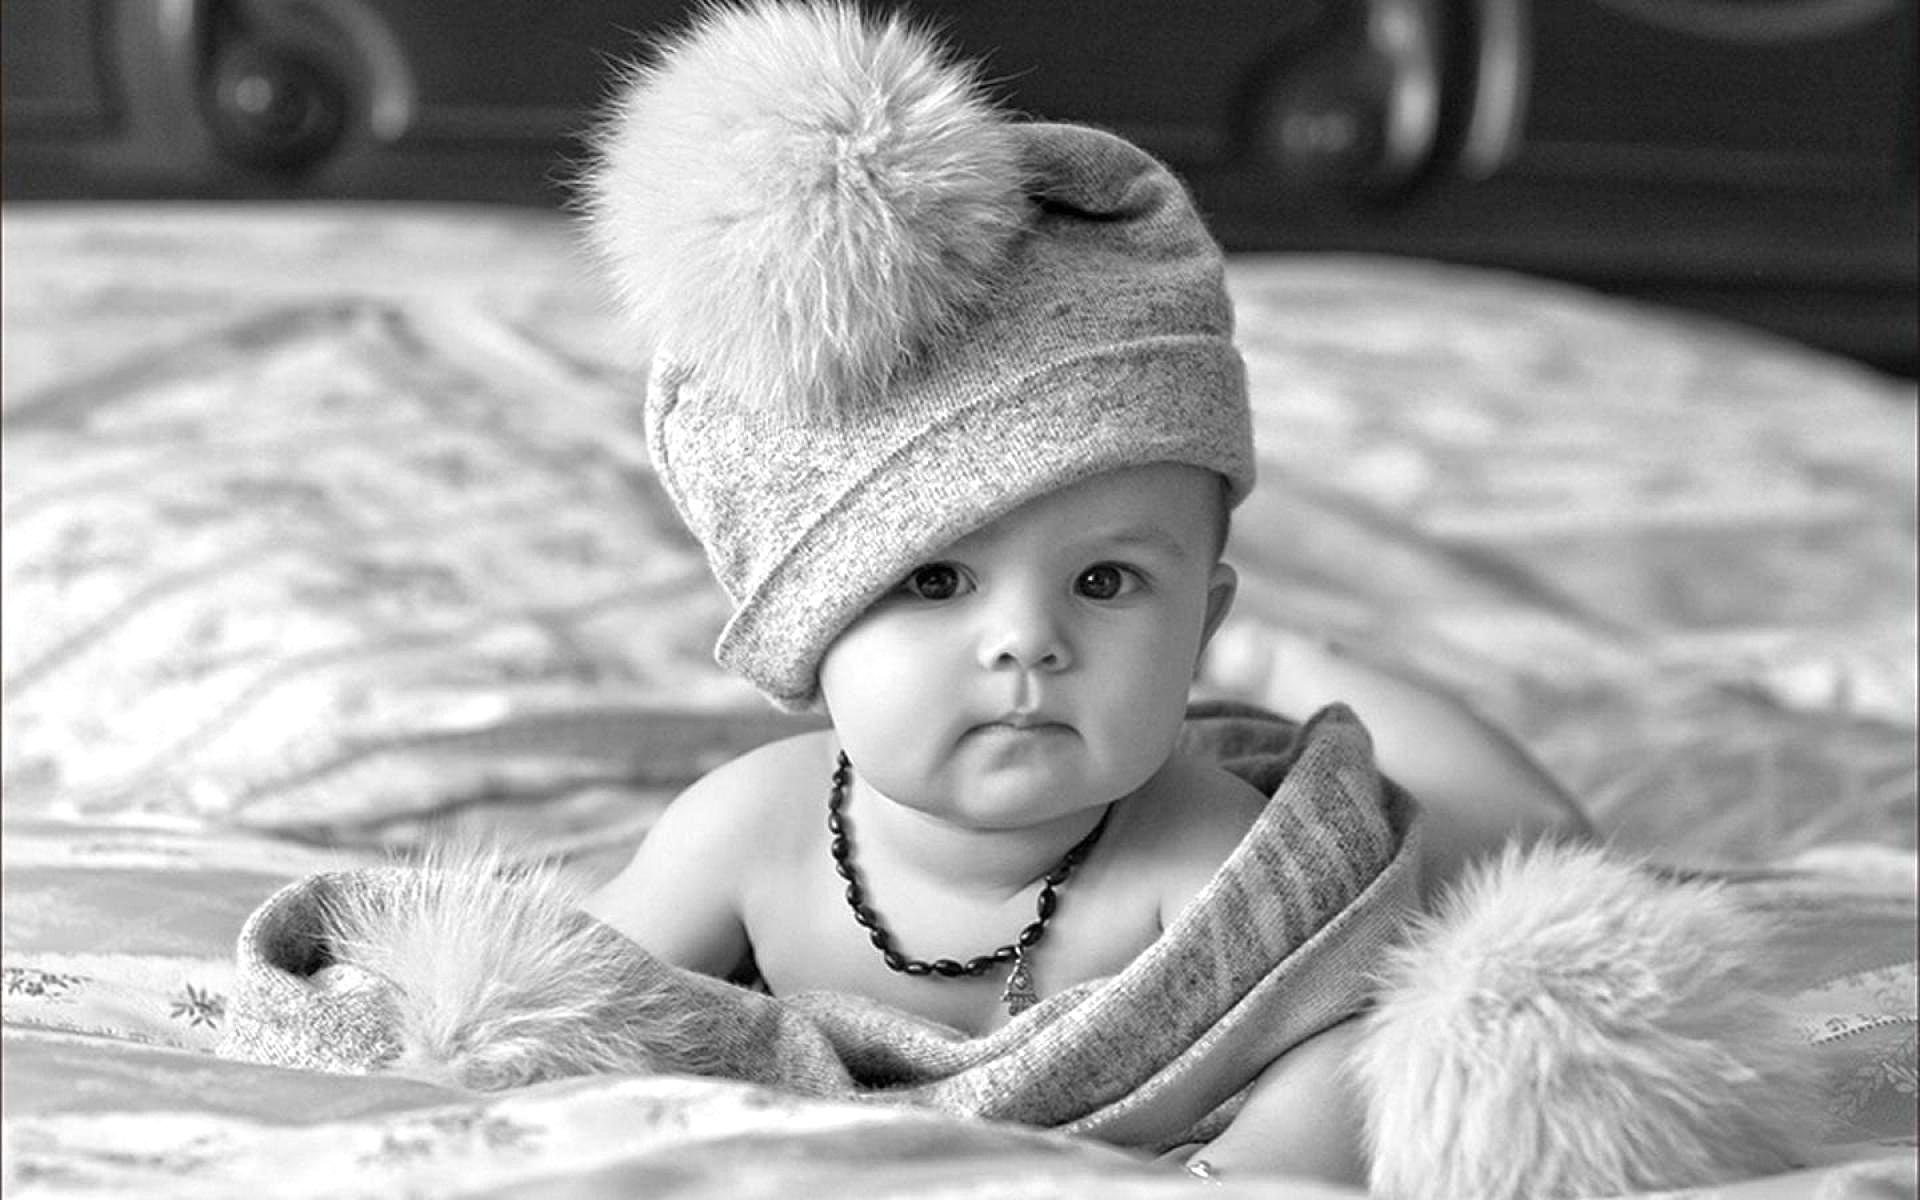 Cute kid HD photograph - New hd wallpaperNew hd wallpaper